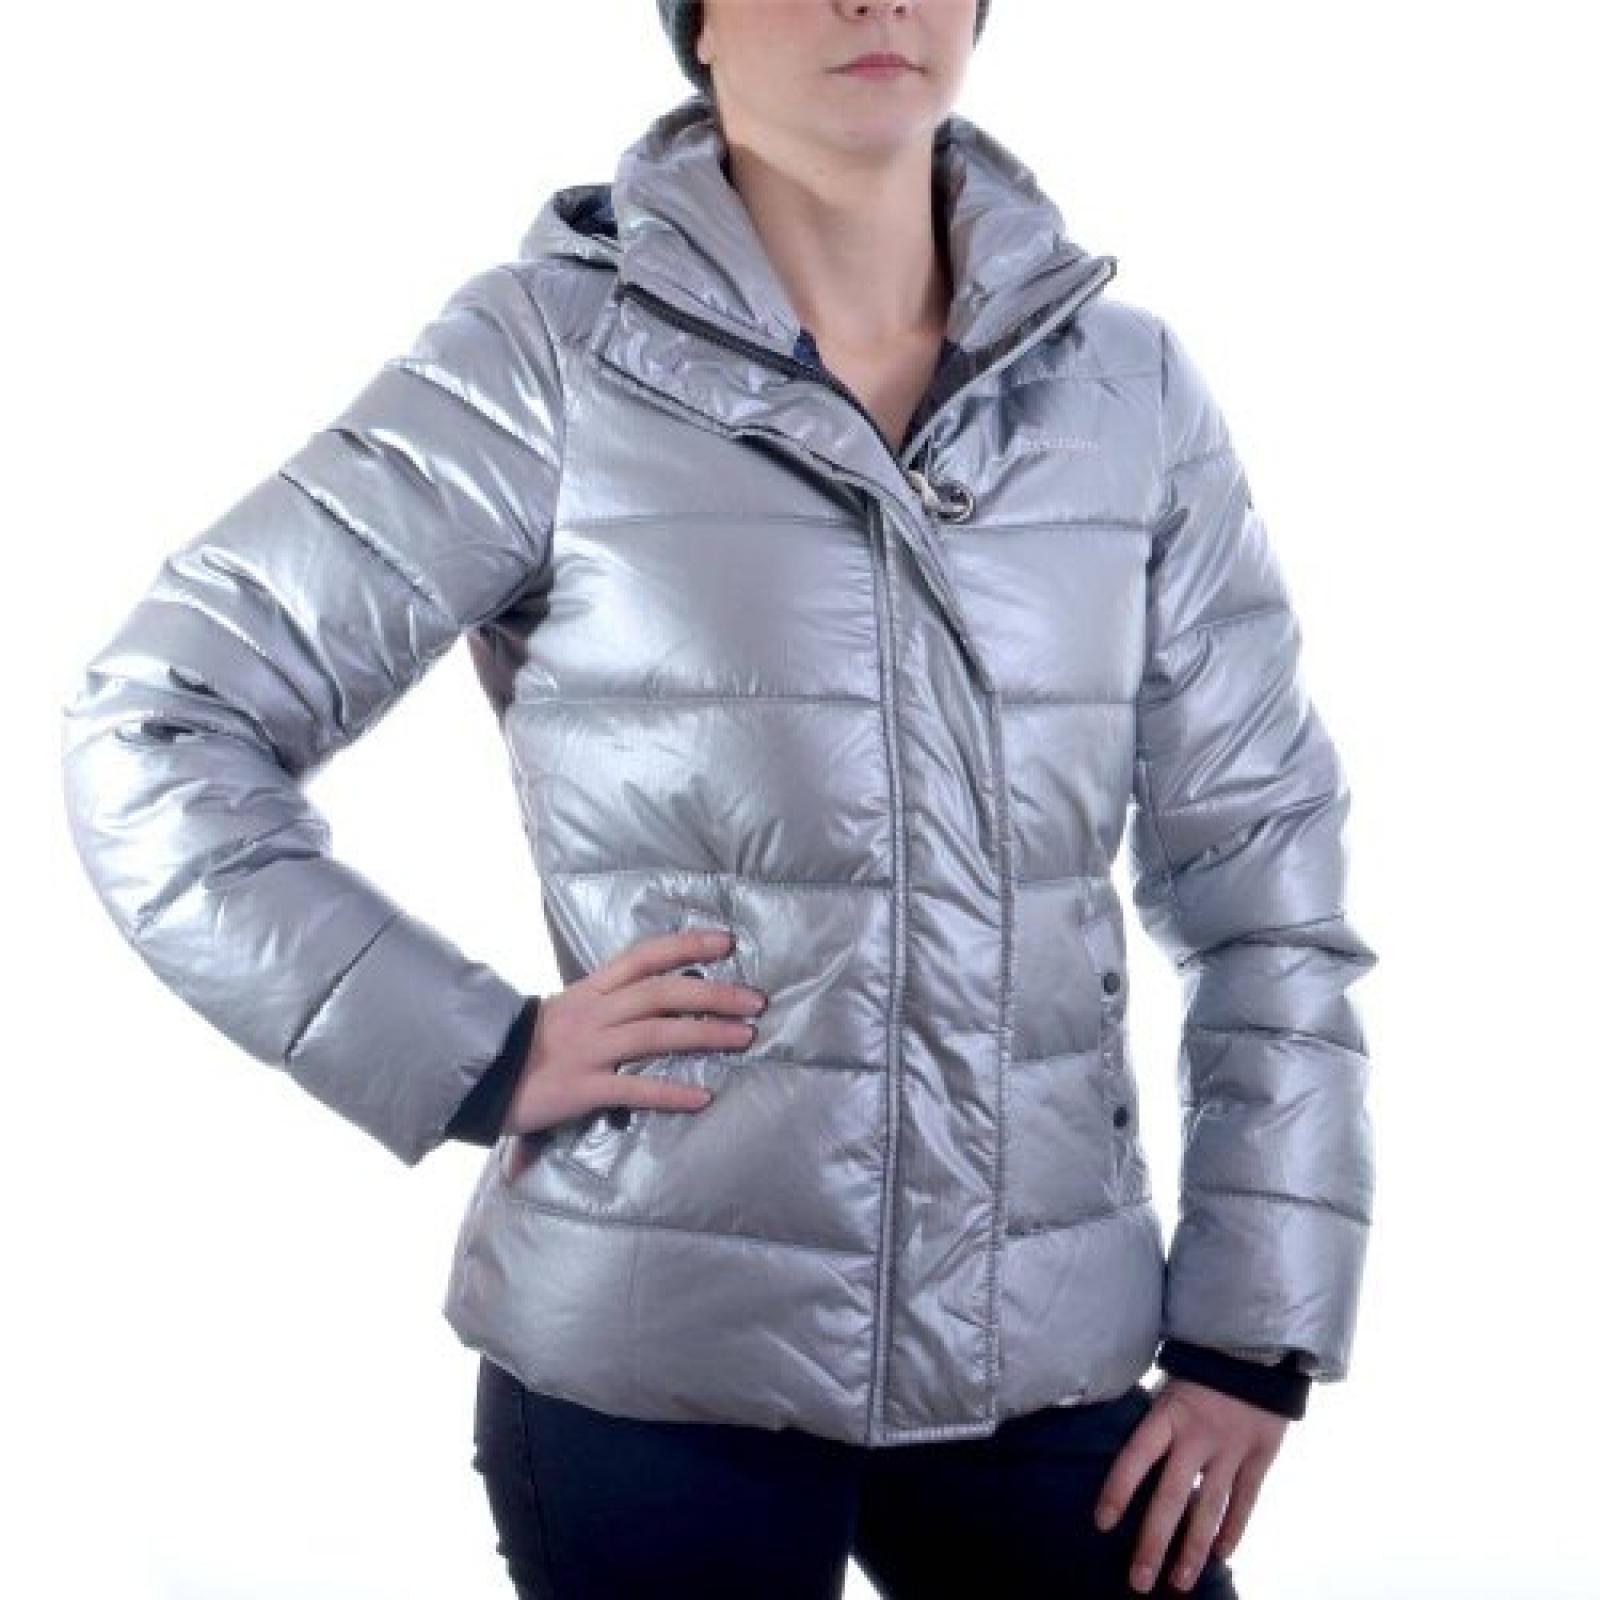 Gaastra Damenjacke Daisies Gr. XL UVP 269,95 Euro 36115022 Silber 203 Jacke